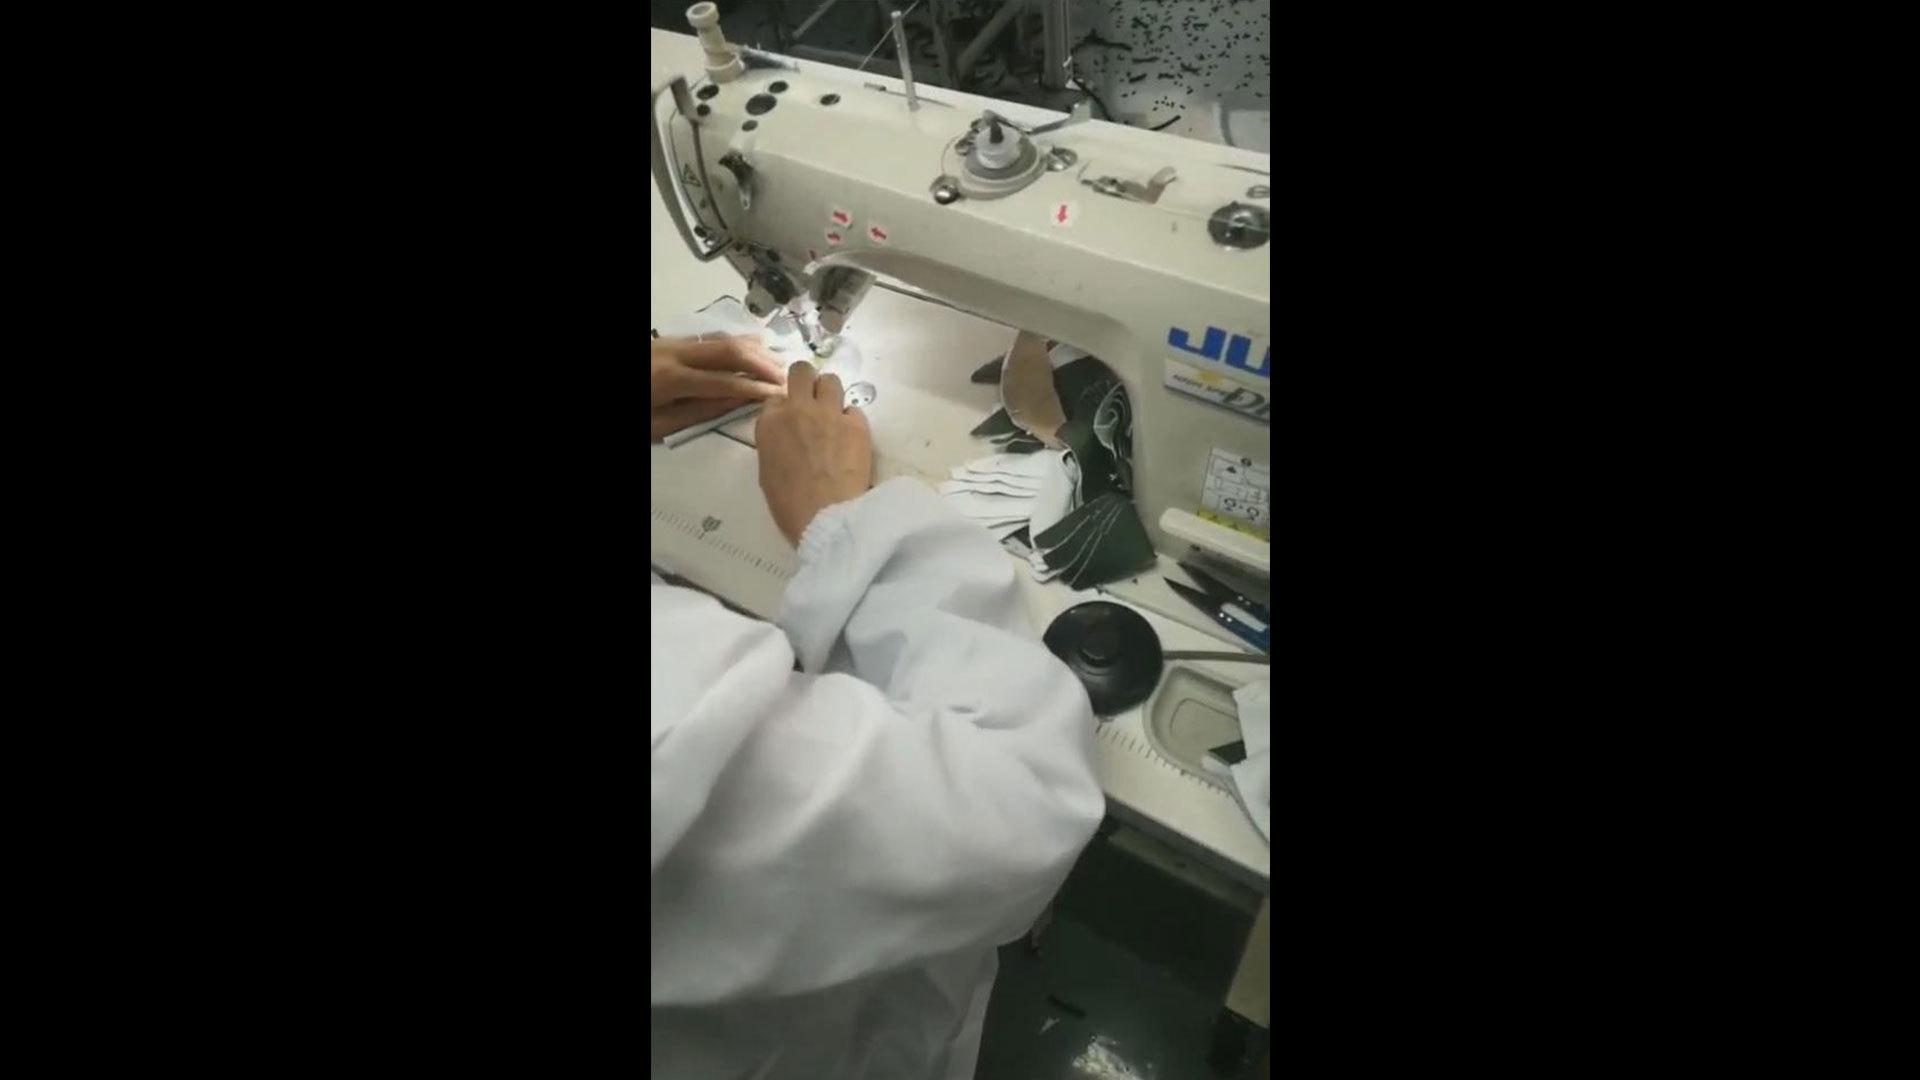 OEM Copper Face Mask Production Step 3